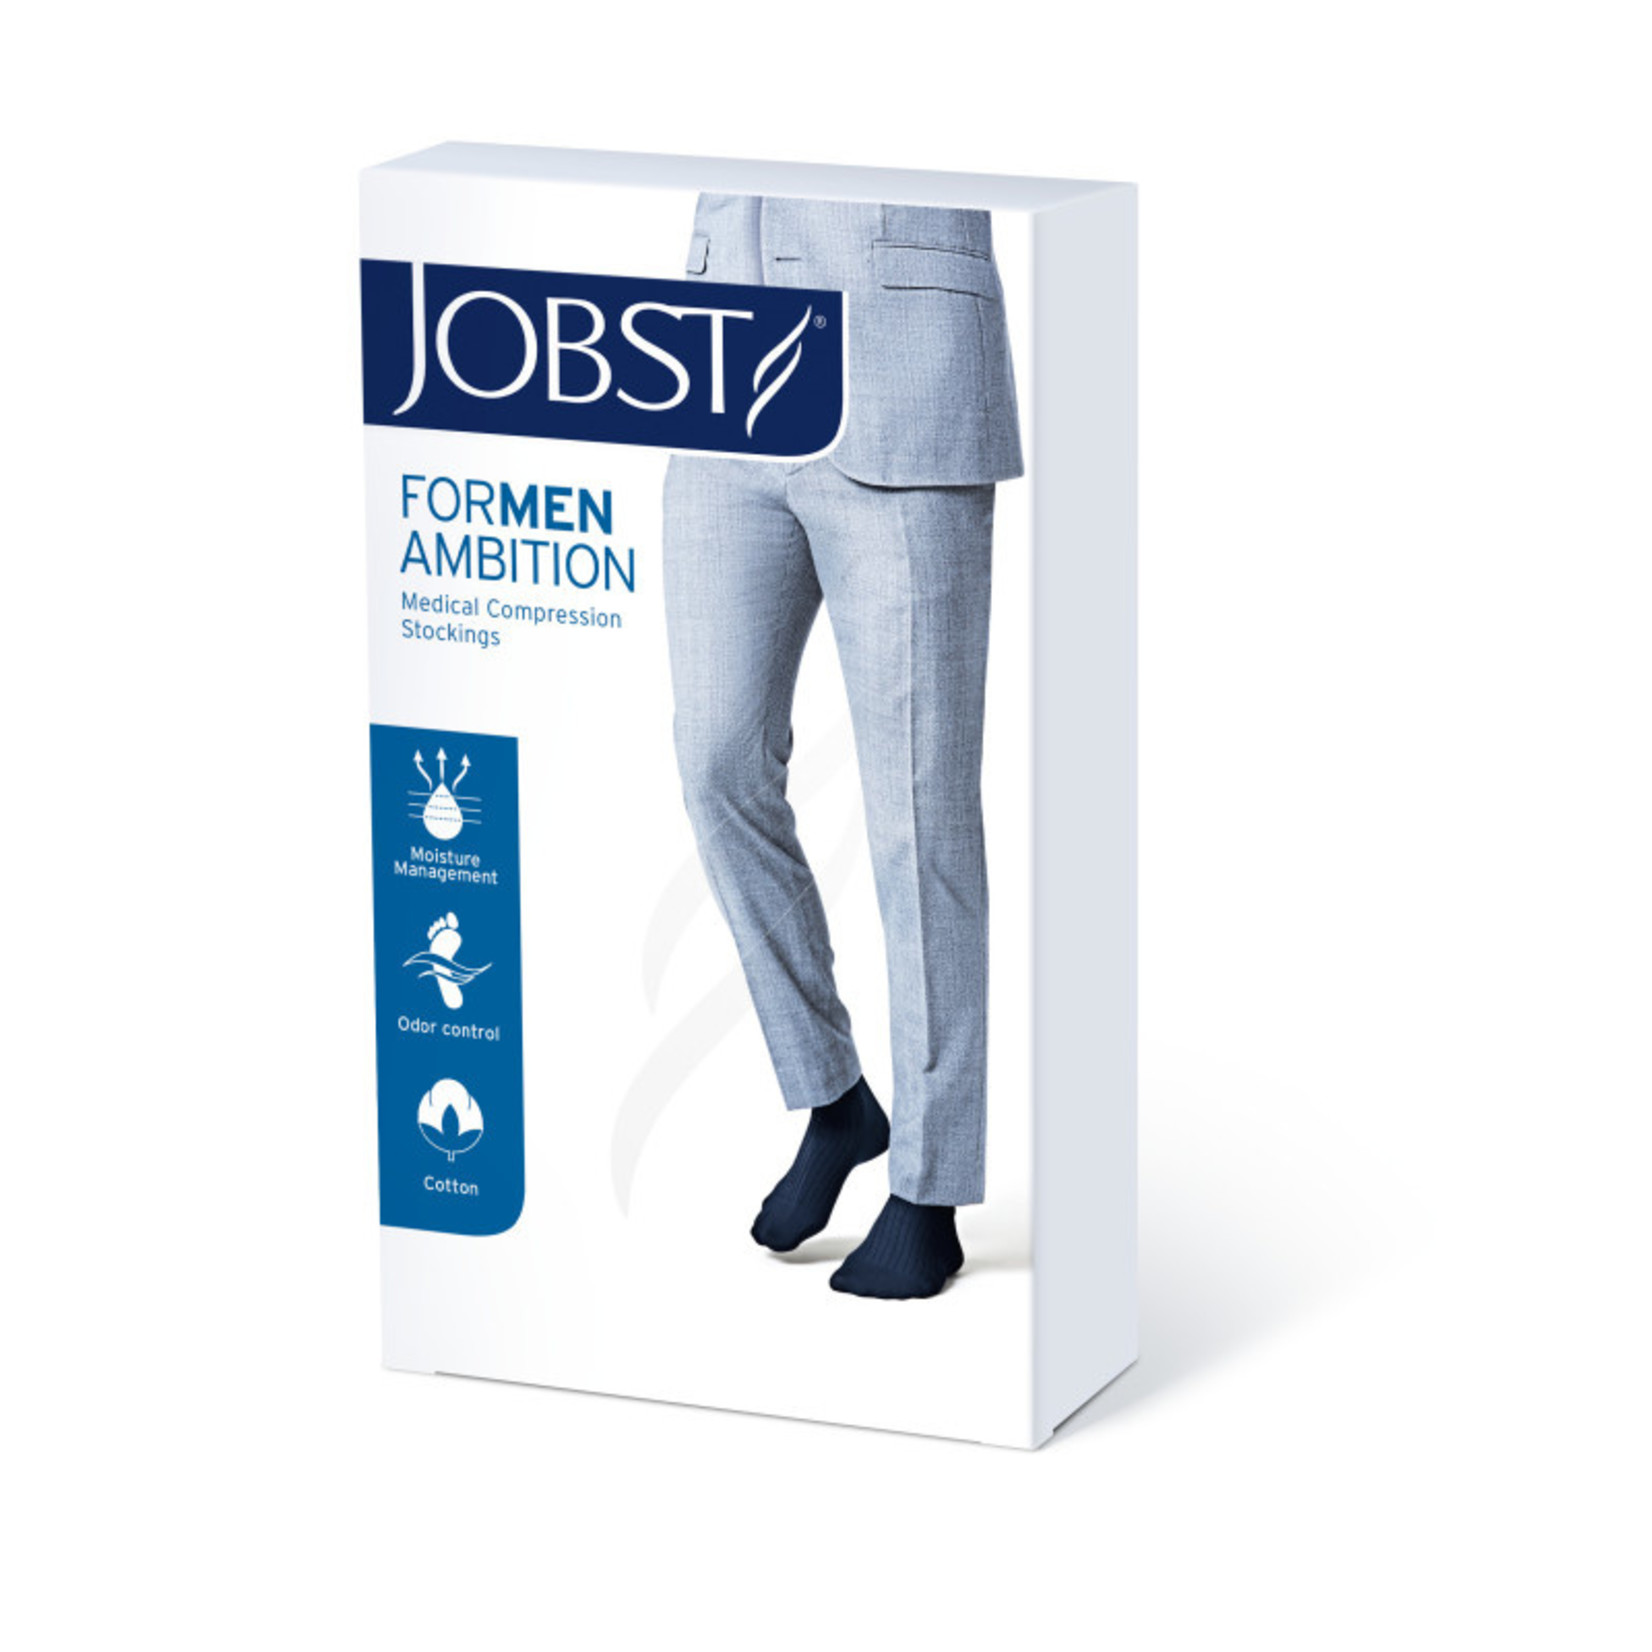 JOBST JOBST FORMEN AMBITION SOFTFIT KNEE 15-20 mmHg